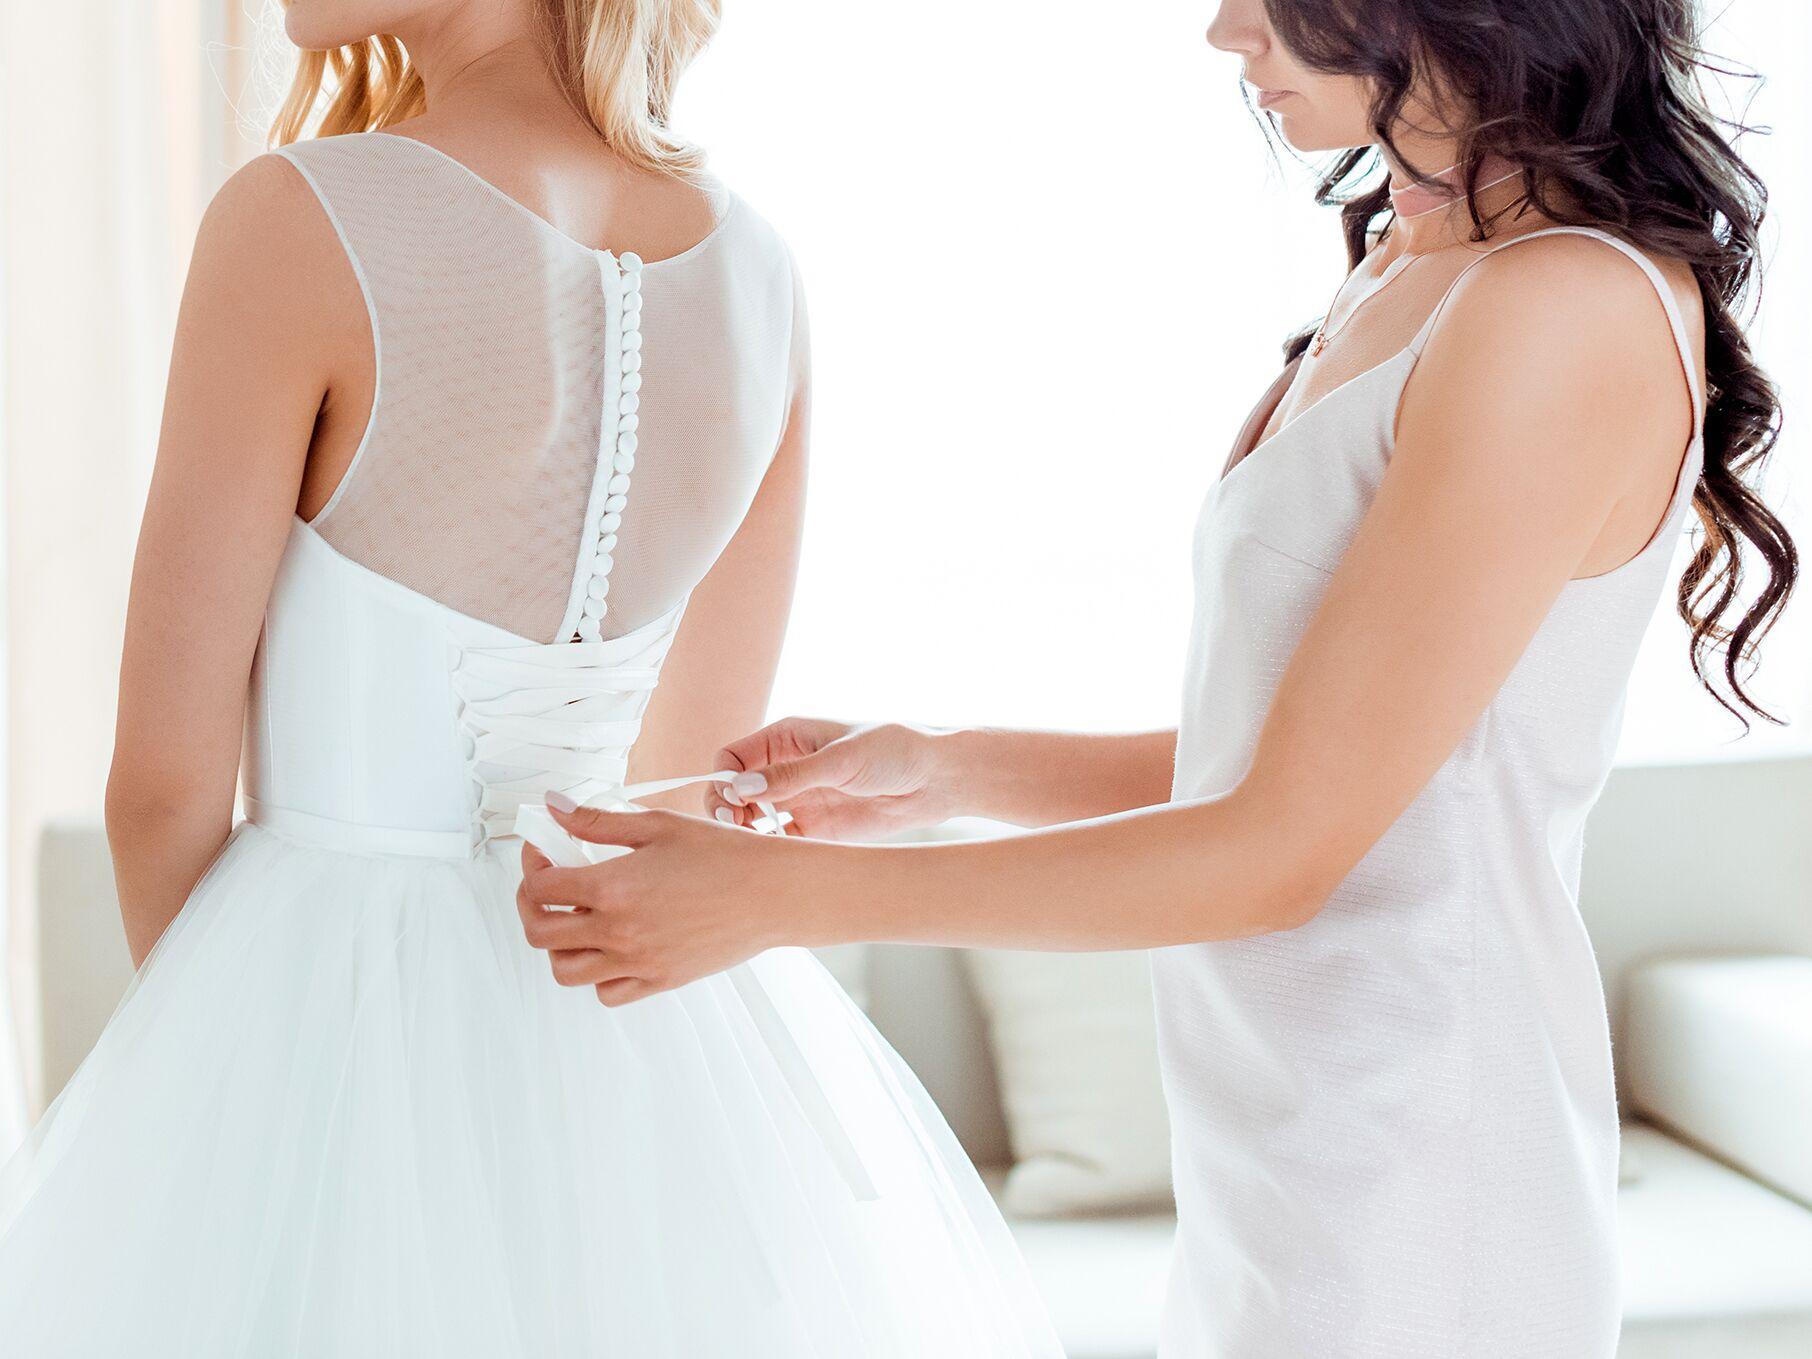 Bridal Shapewear And Undergarments Under The Wedding Dress Essentials,Dress For Beach Wedding Guest 2020